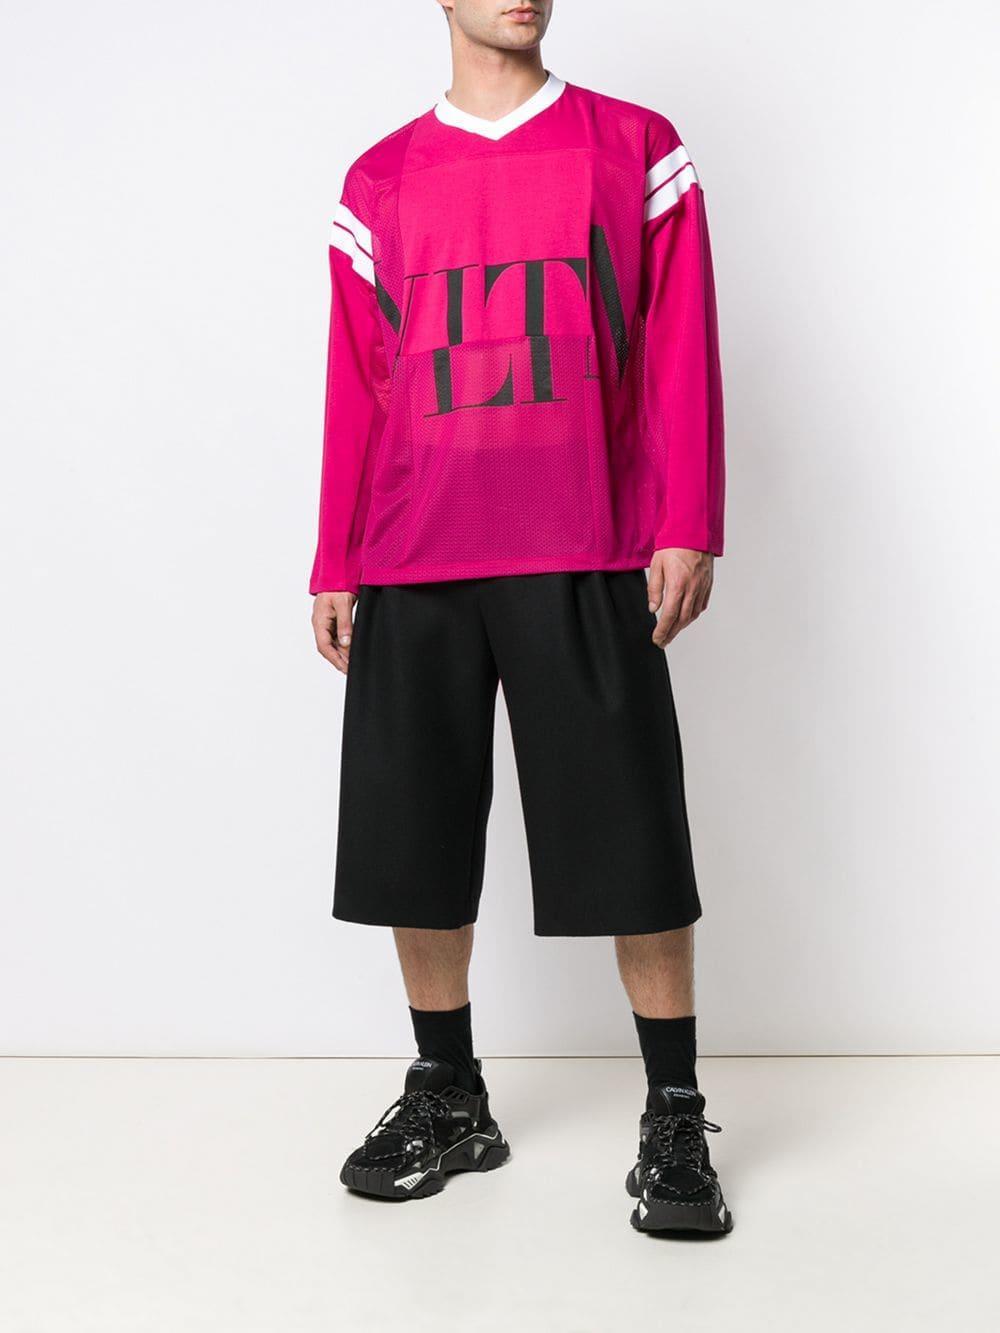 a9ce10623 Lyst - Valentino 'vltn' Logo Print Basketball T-shirt in Pink for Men